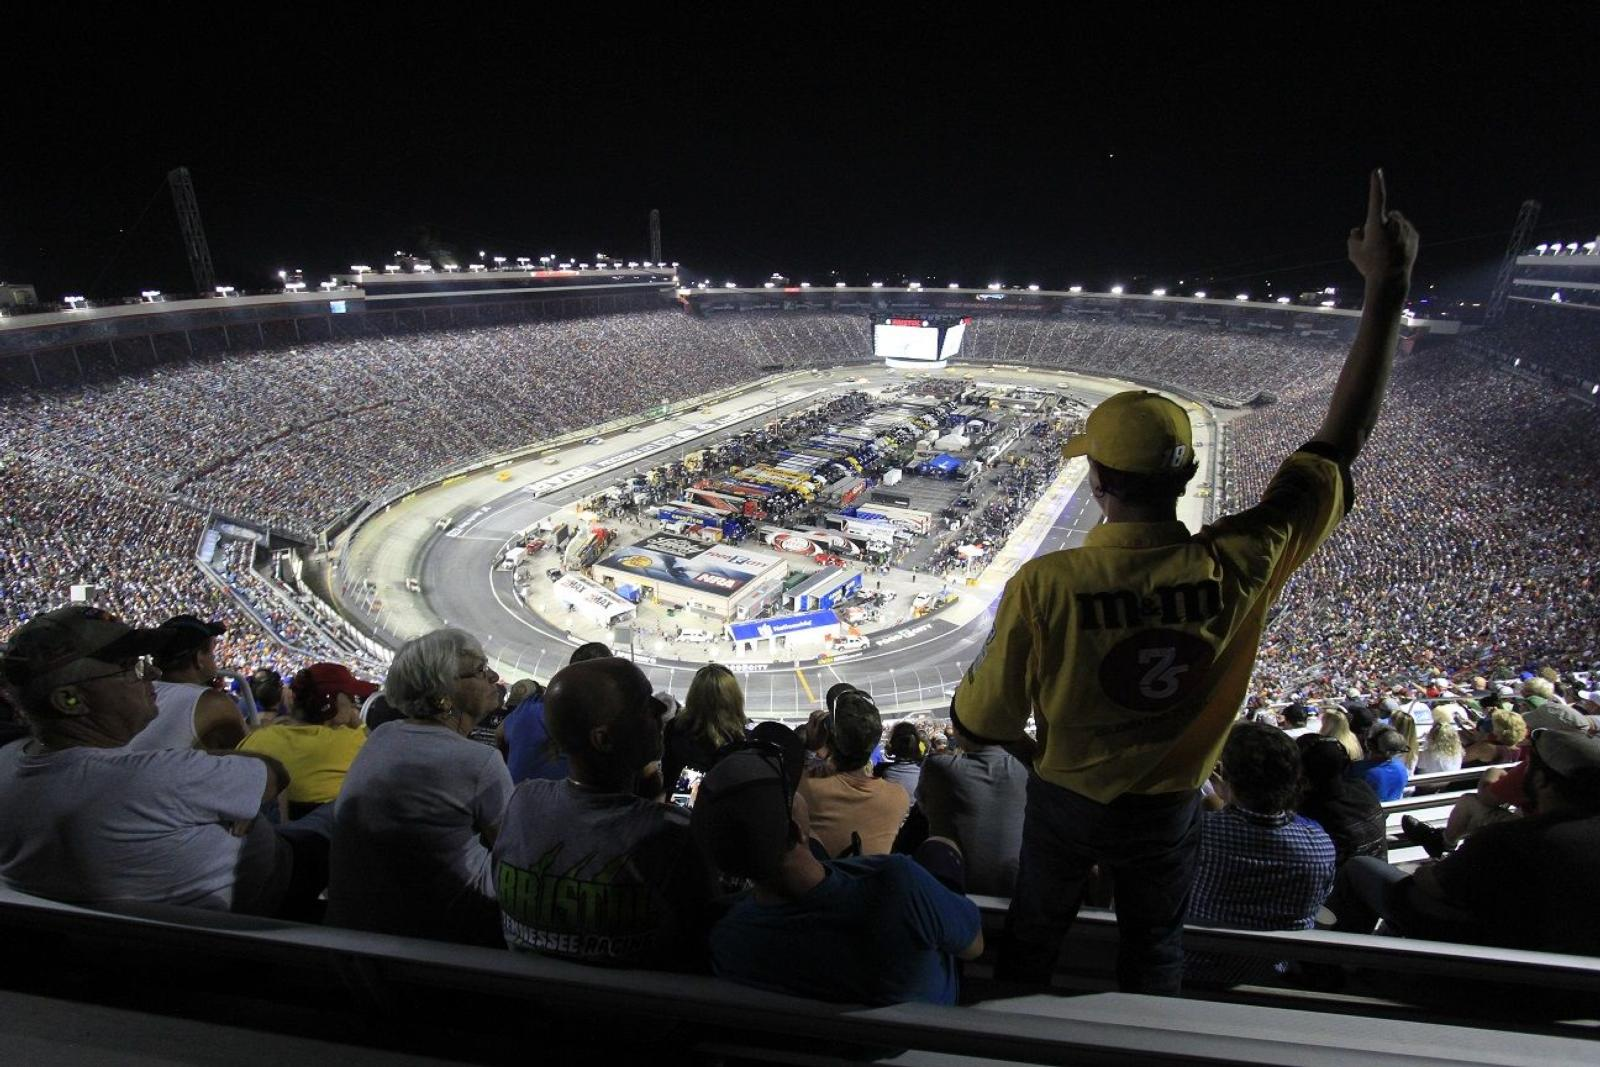 bristol night race 2020 tickets